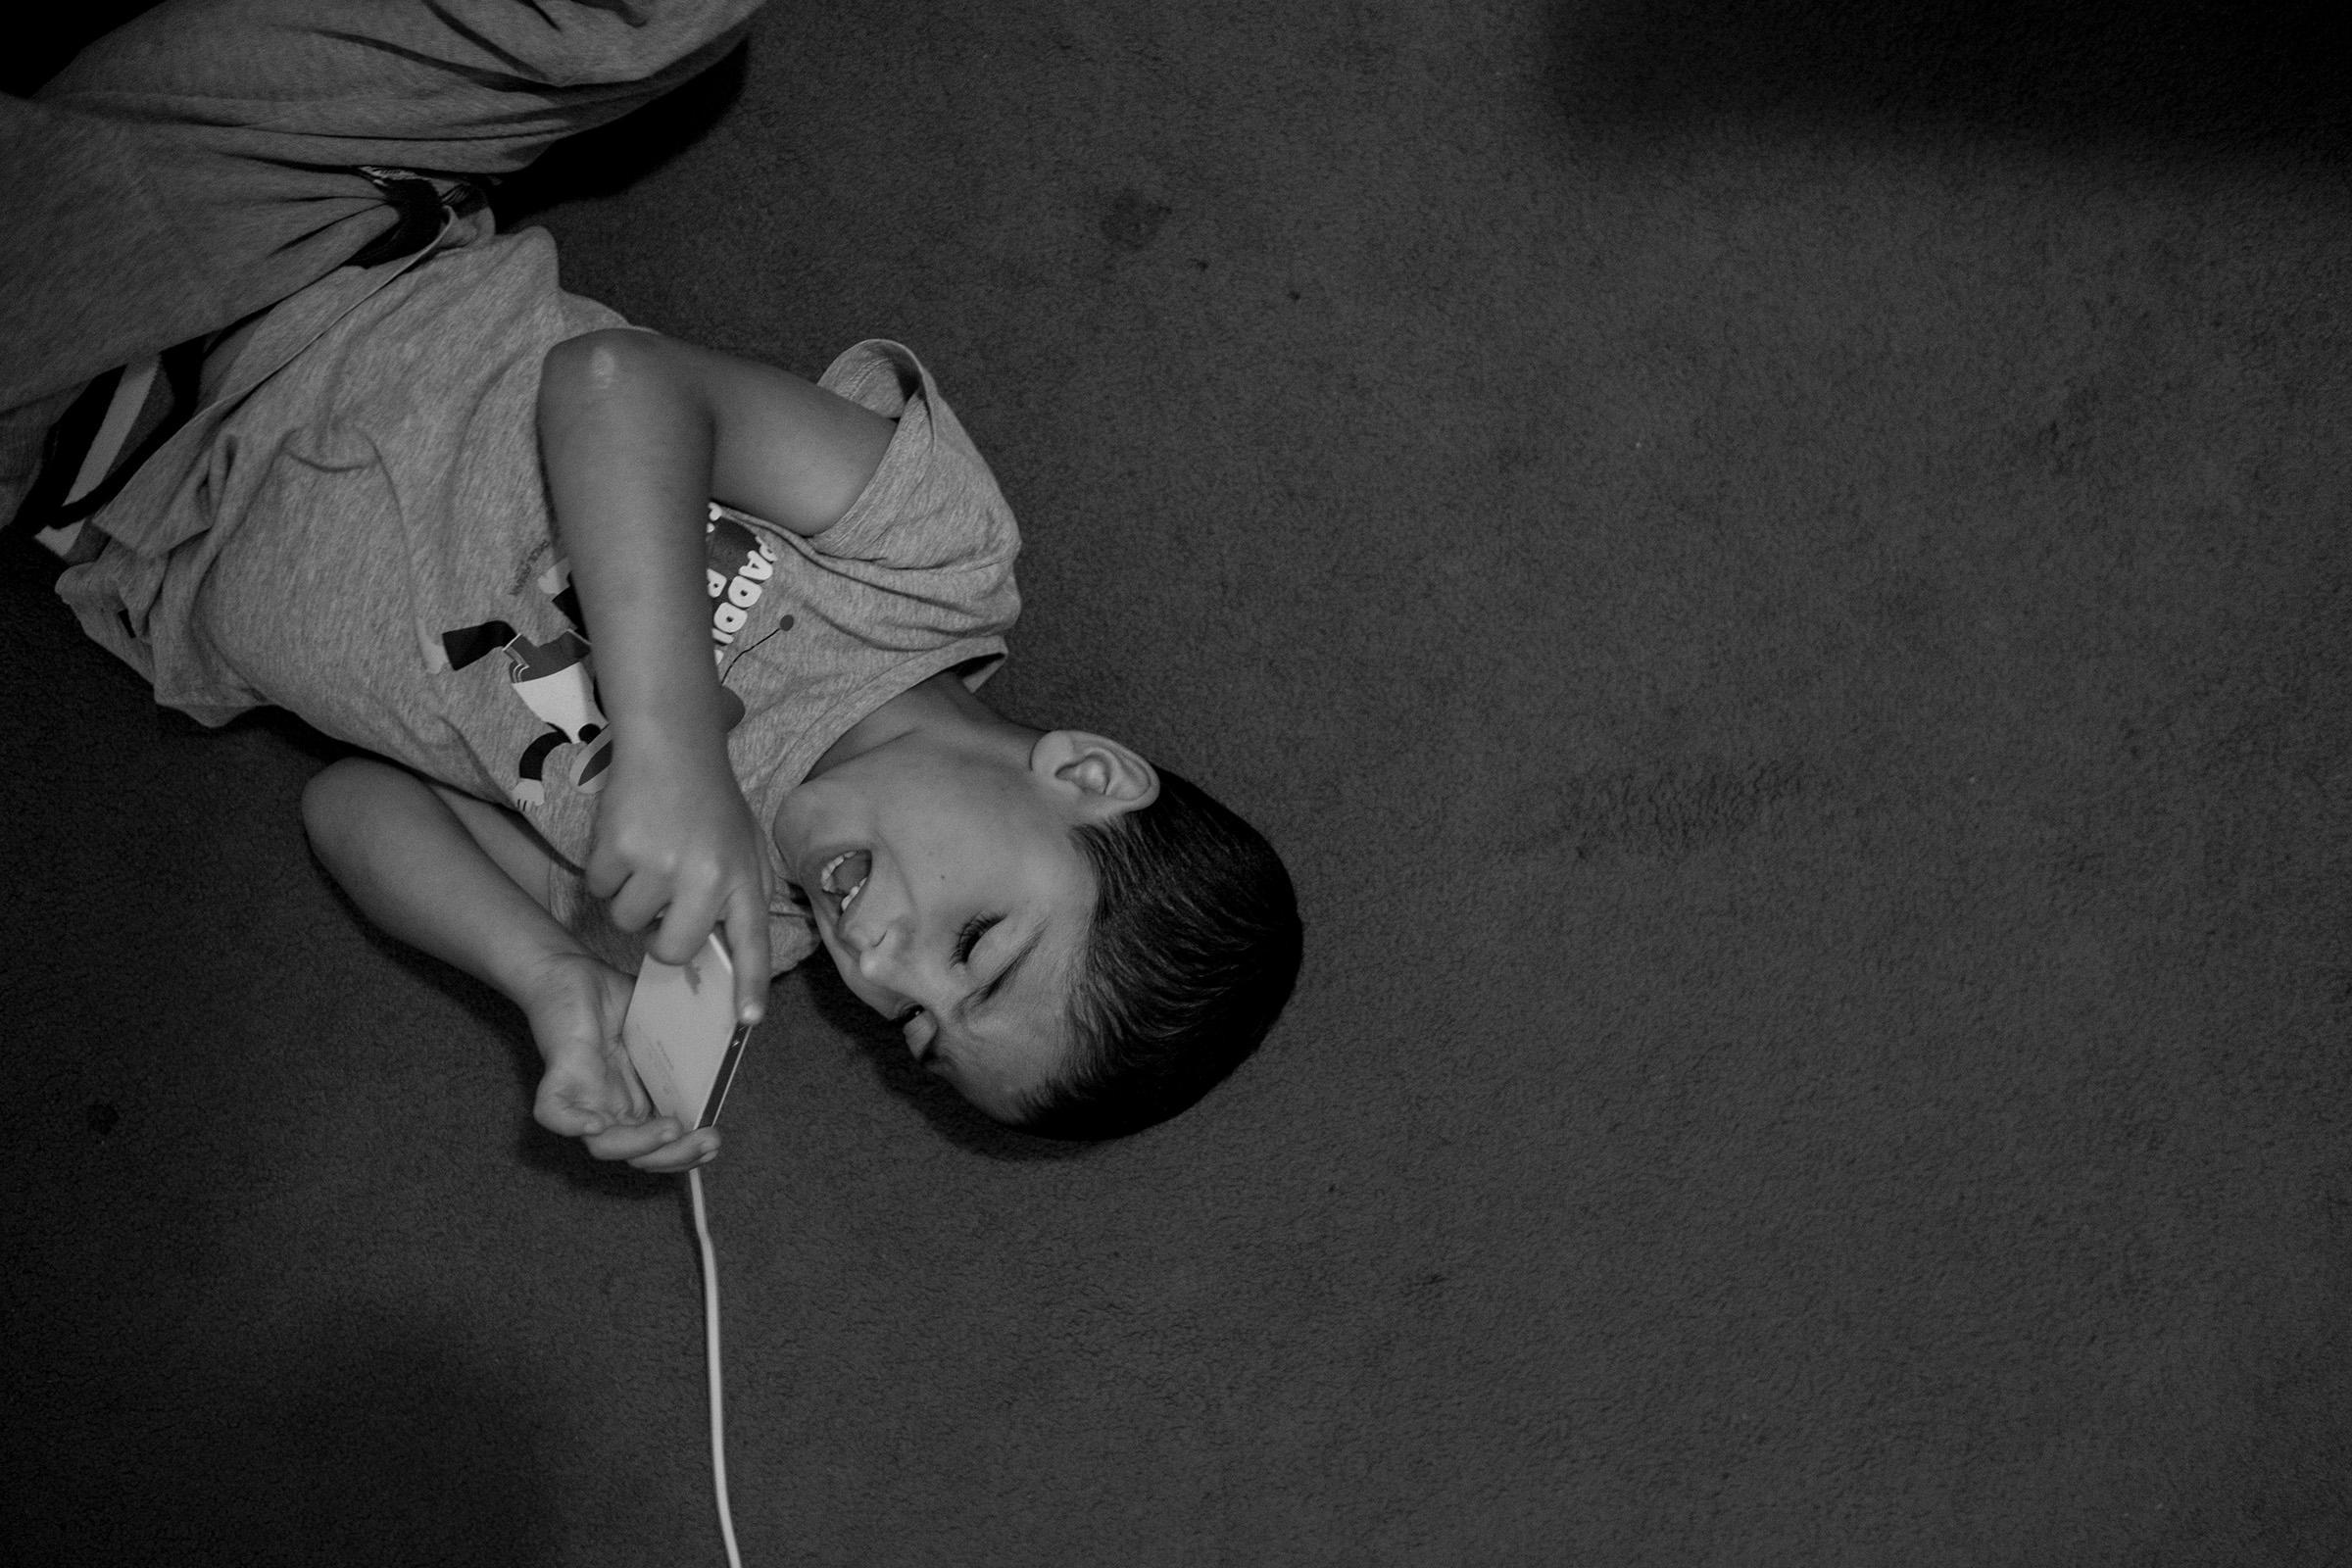 fluechtlinge-syrien-berlin-asyl-integration-amboden